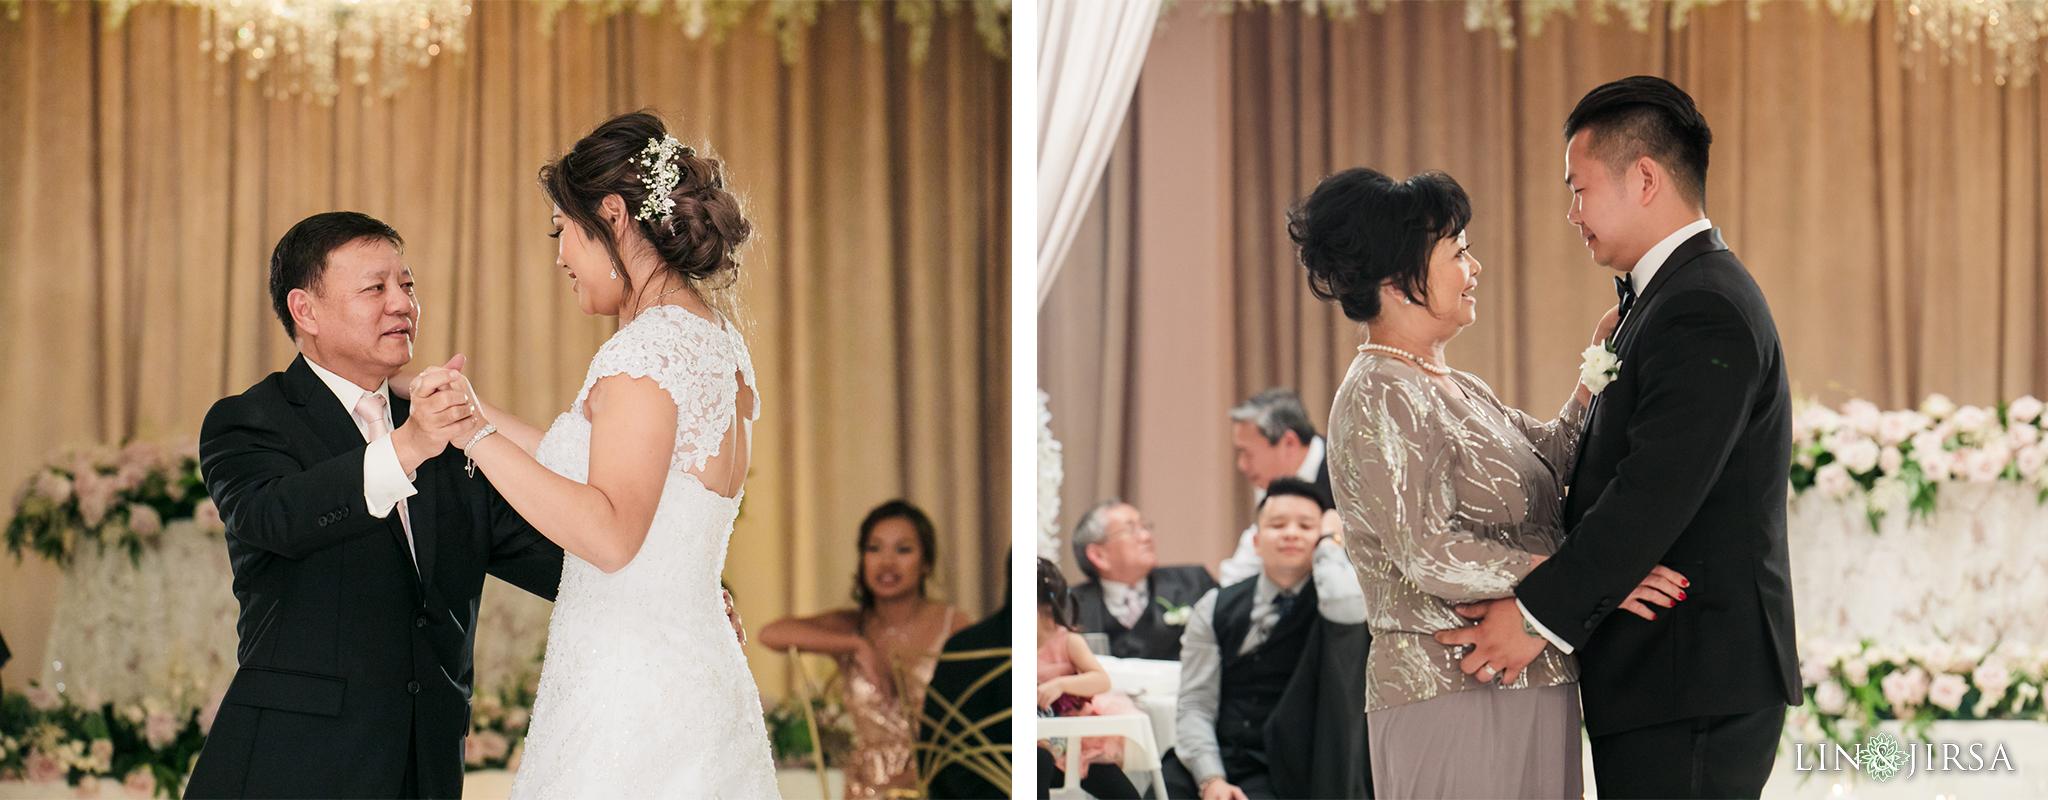 26 The Newport Beach Marriott Hotel Wedding Photography